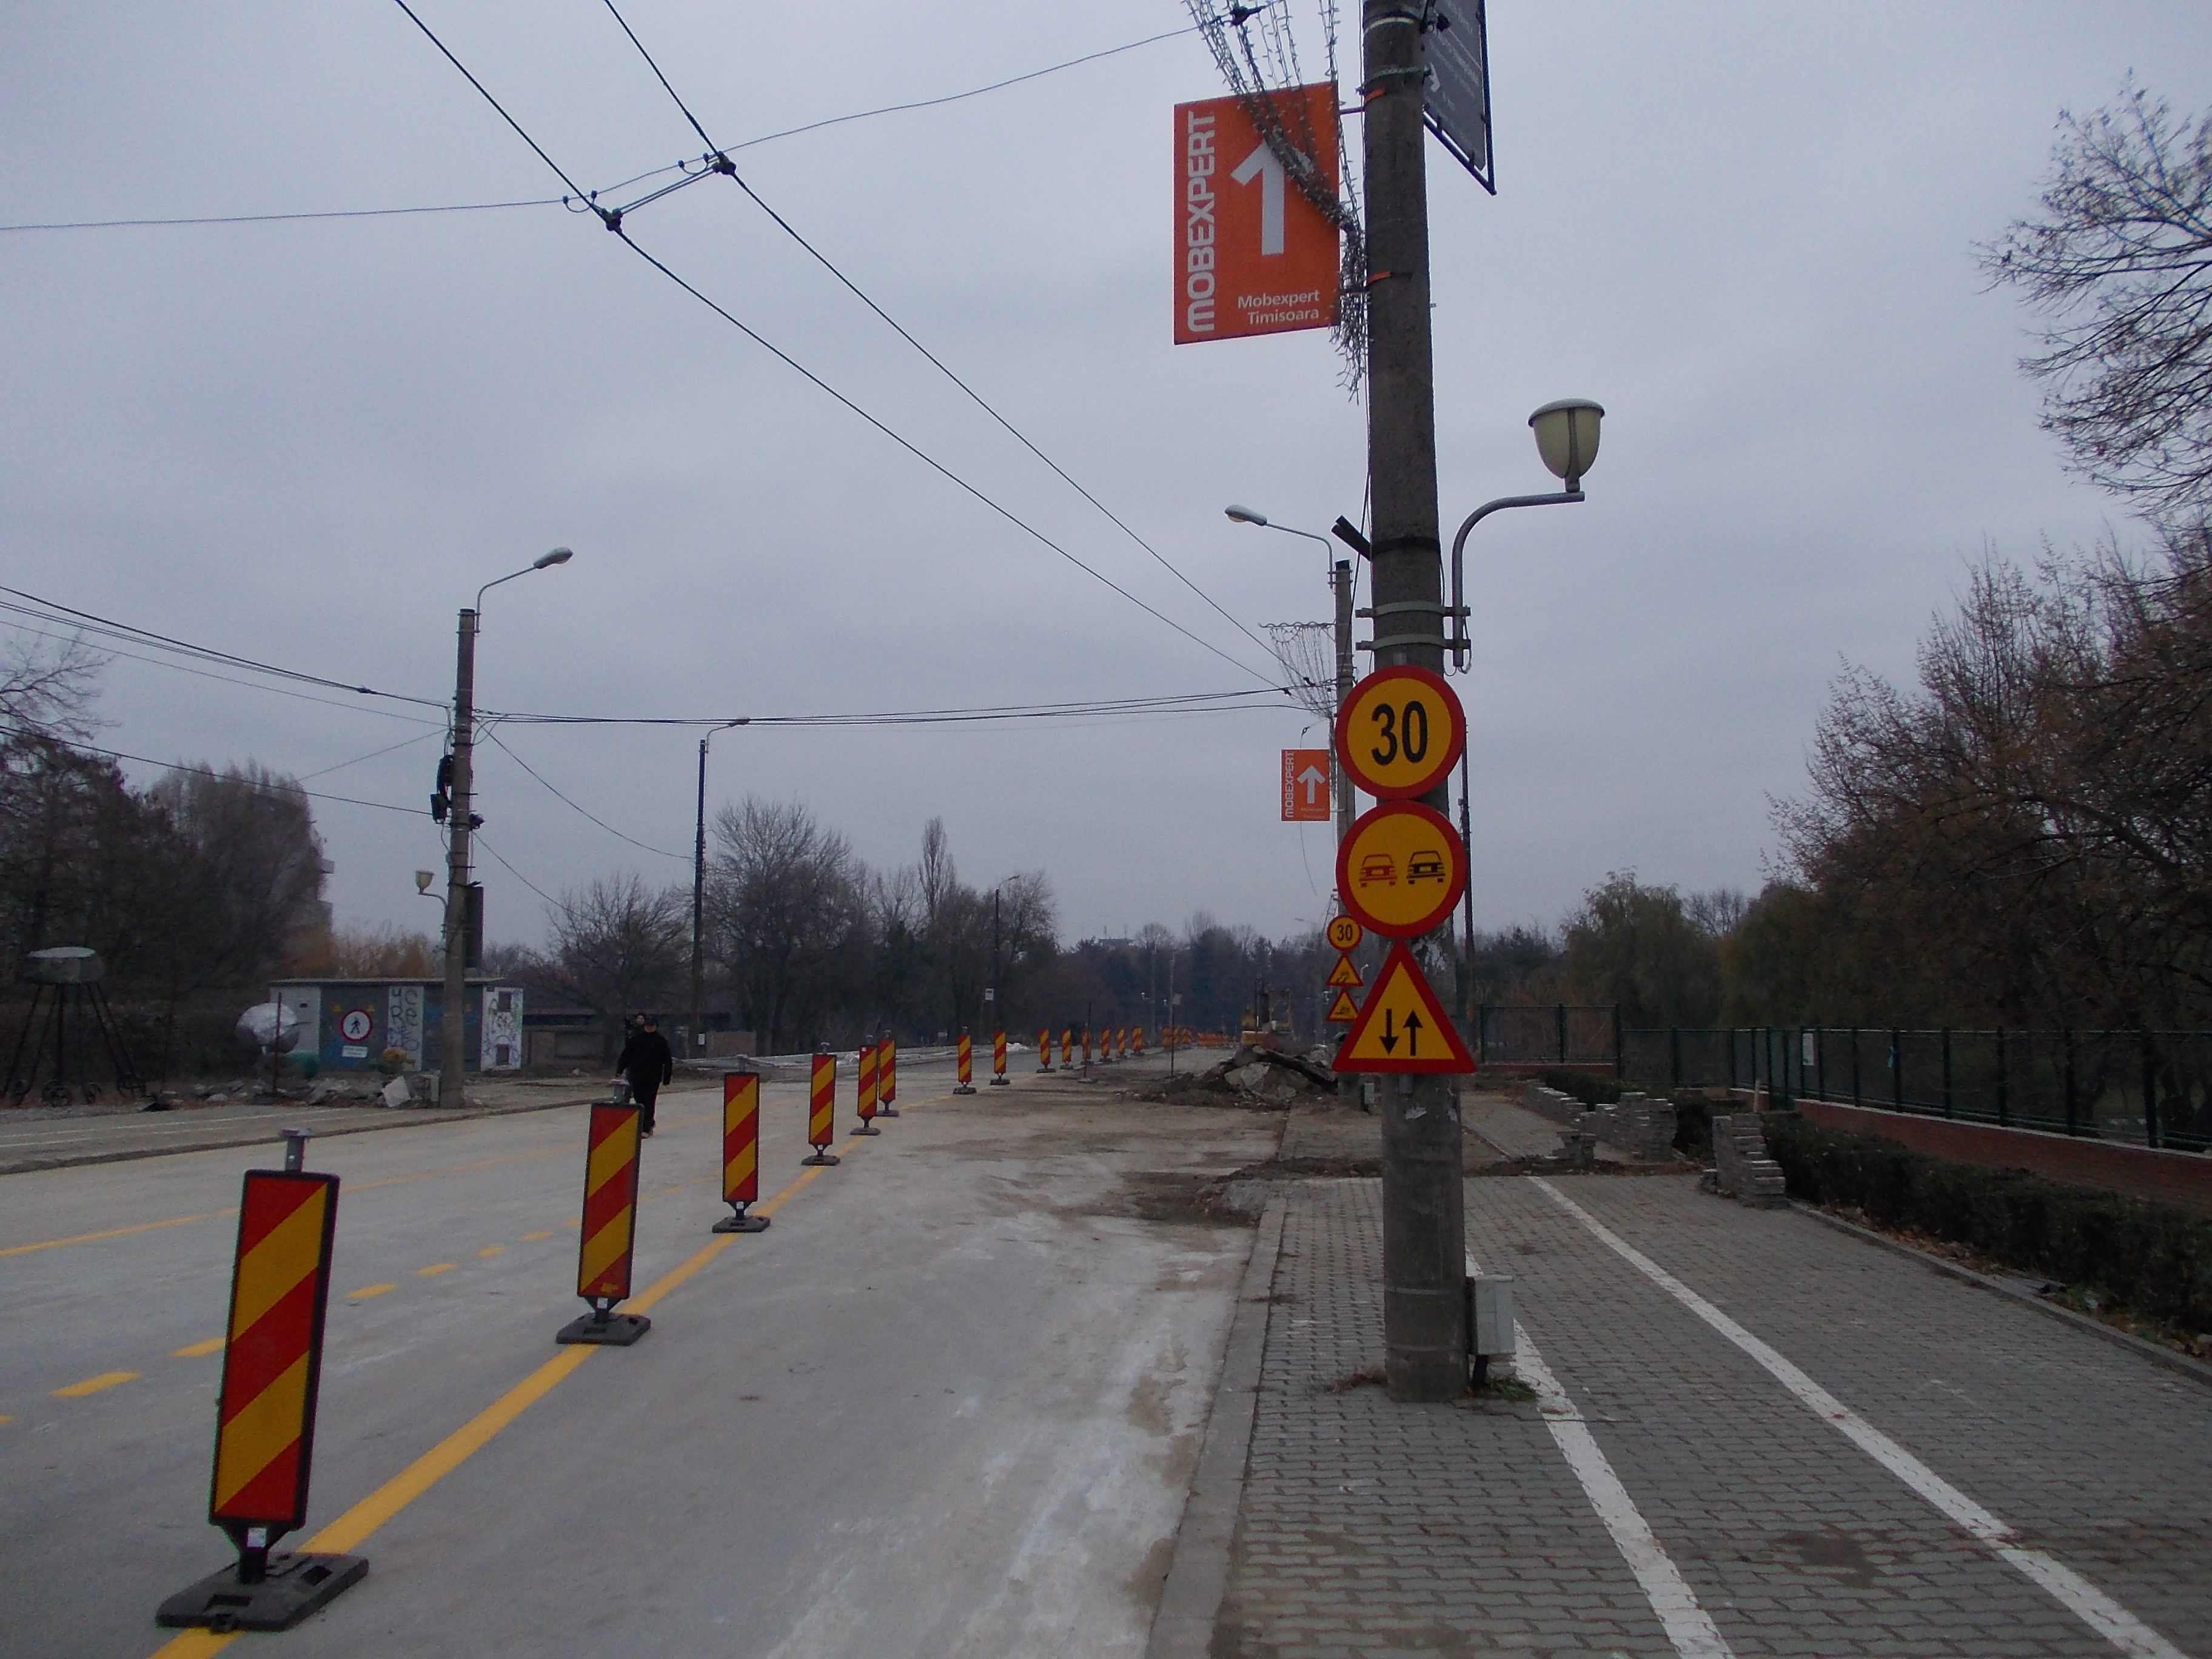 Traficul rutier in zona Michelangelo se inchide! Lucrarile la noul subpasaj avanseaza. Ce rute alternative au soferii